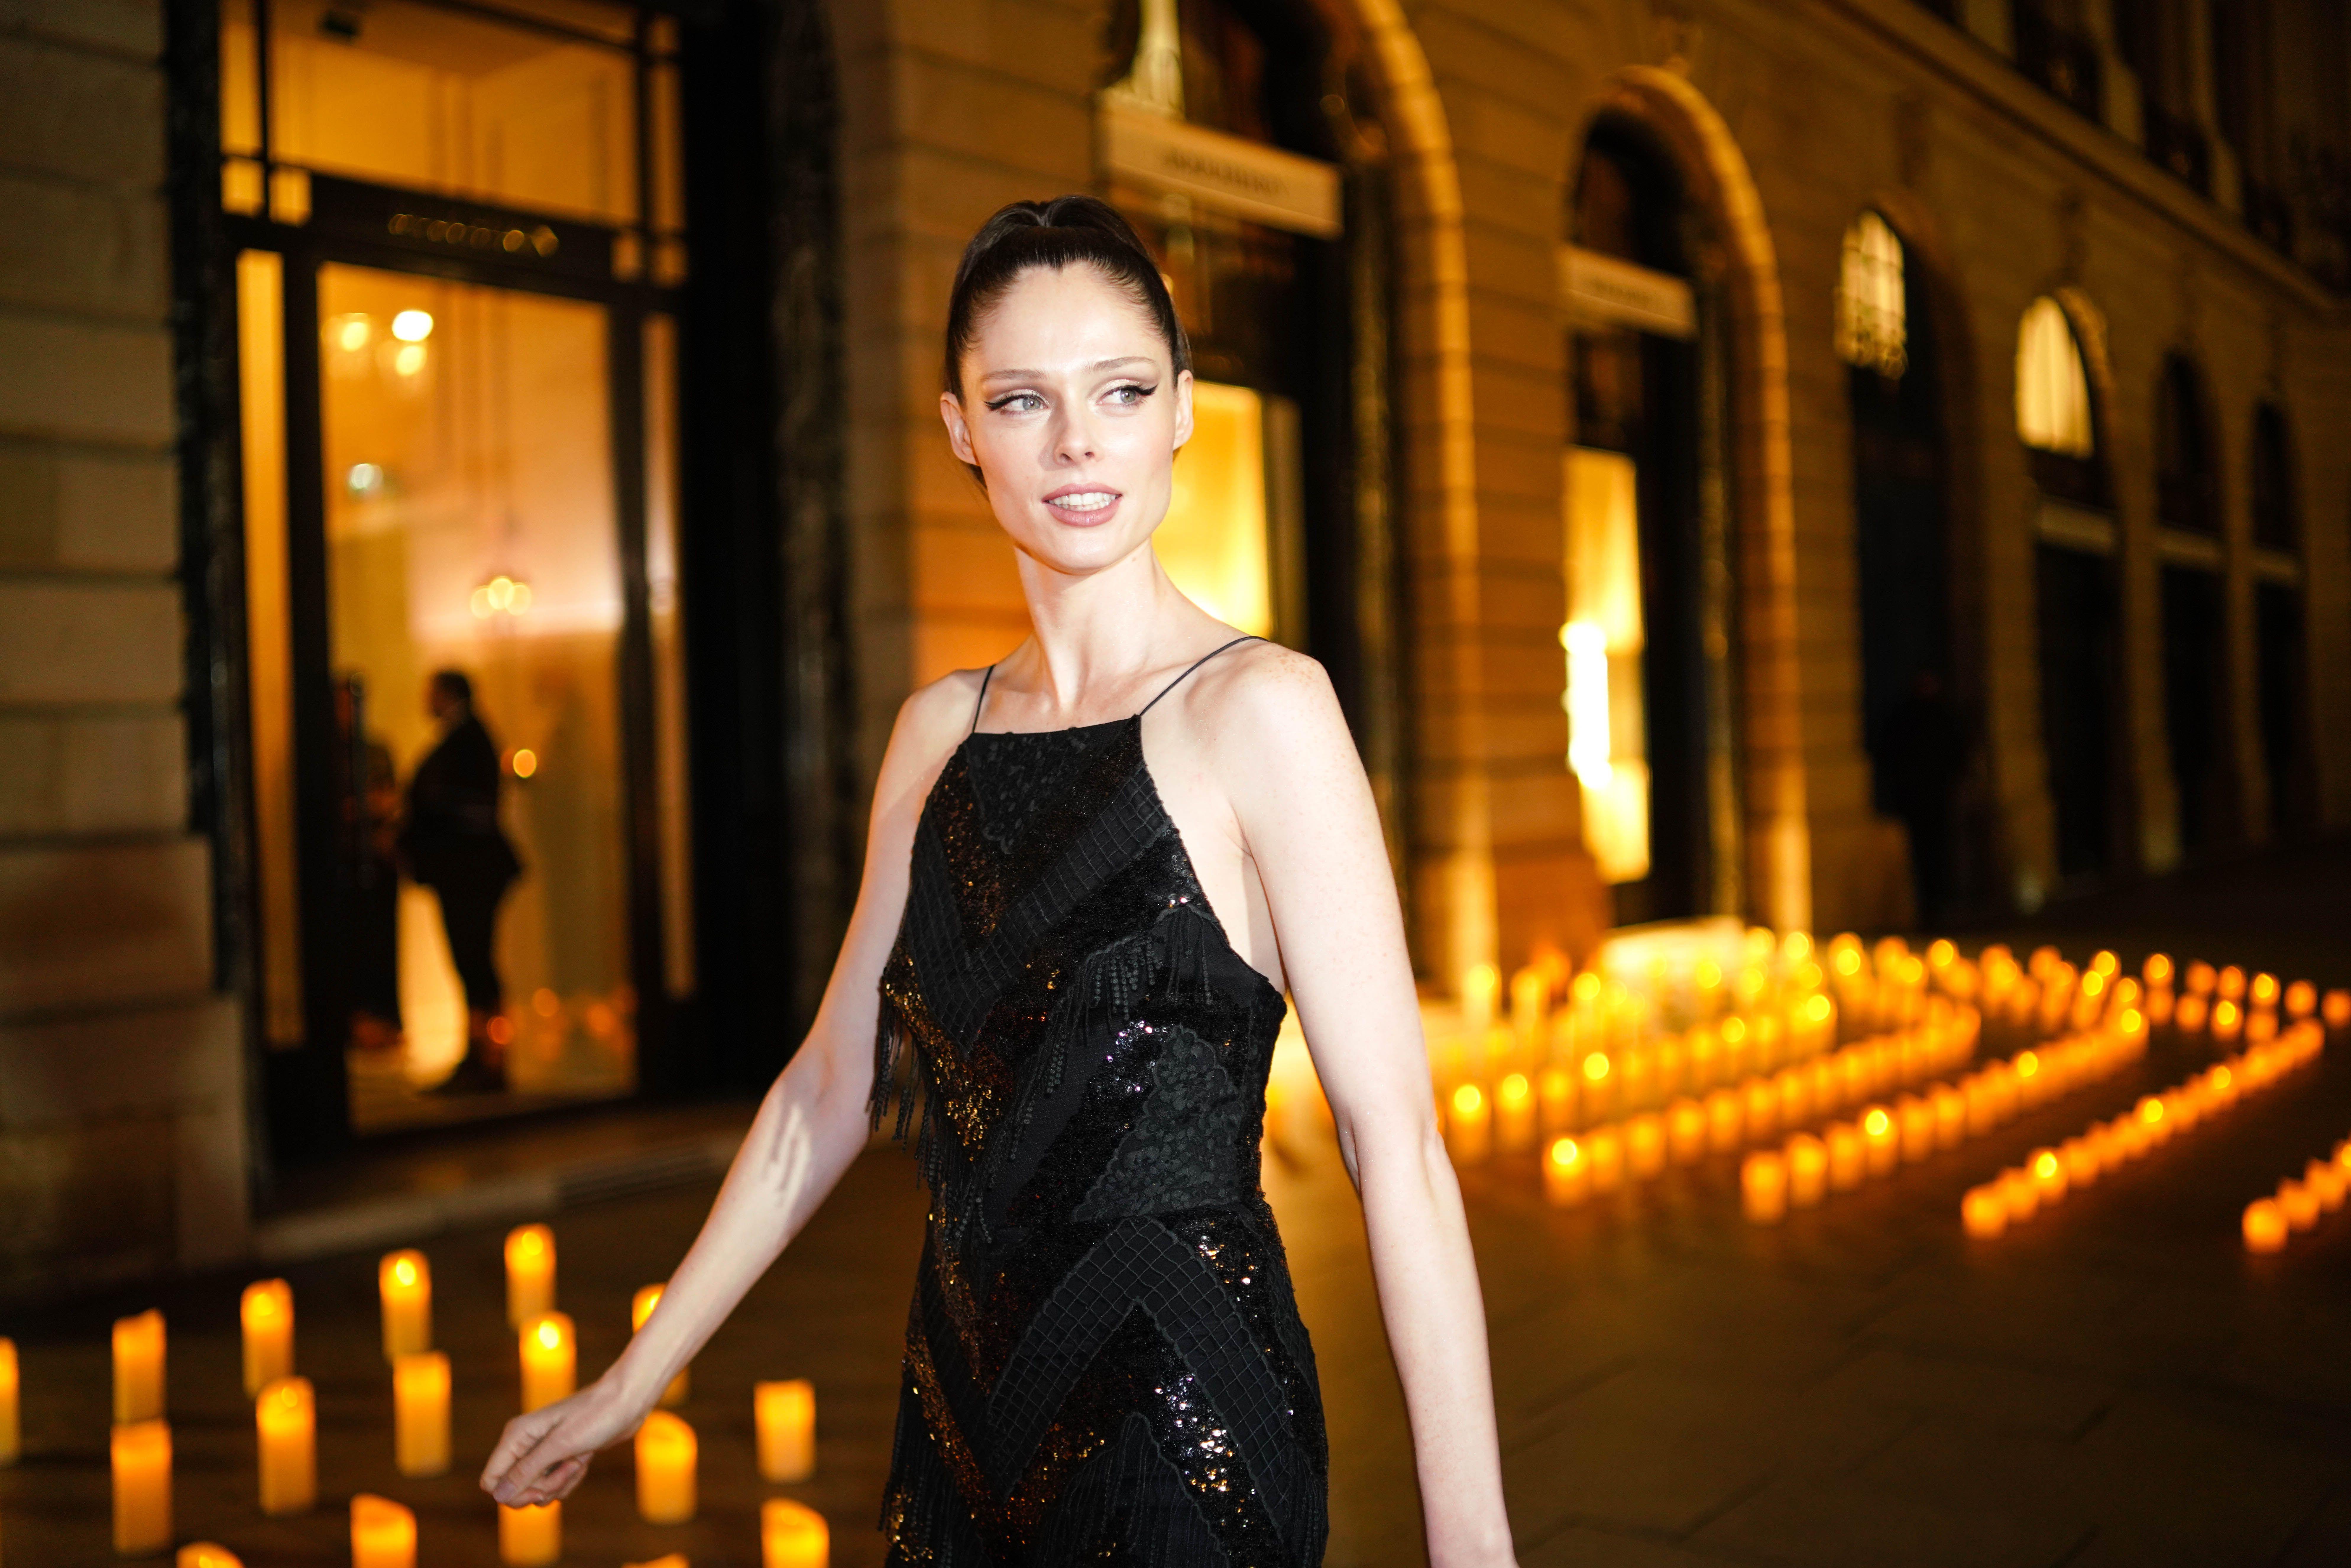 Model Coco Rocha outside Boucheron, during a Paris Fashion Week